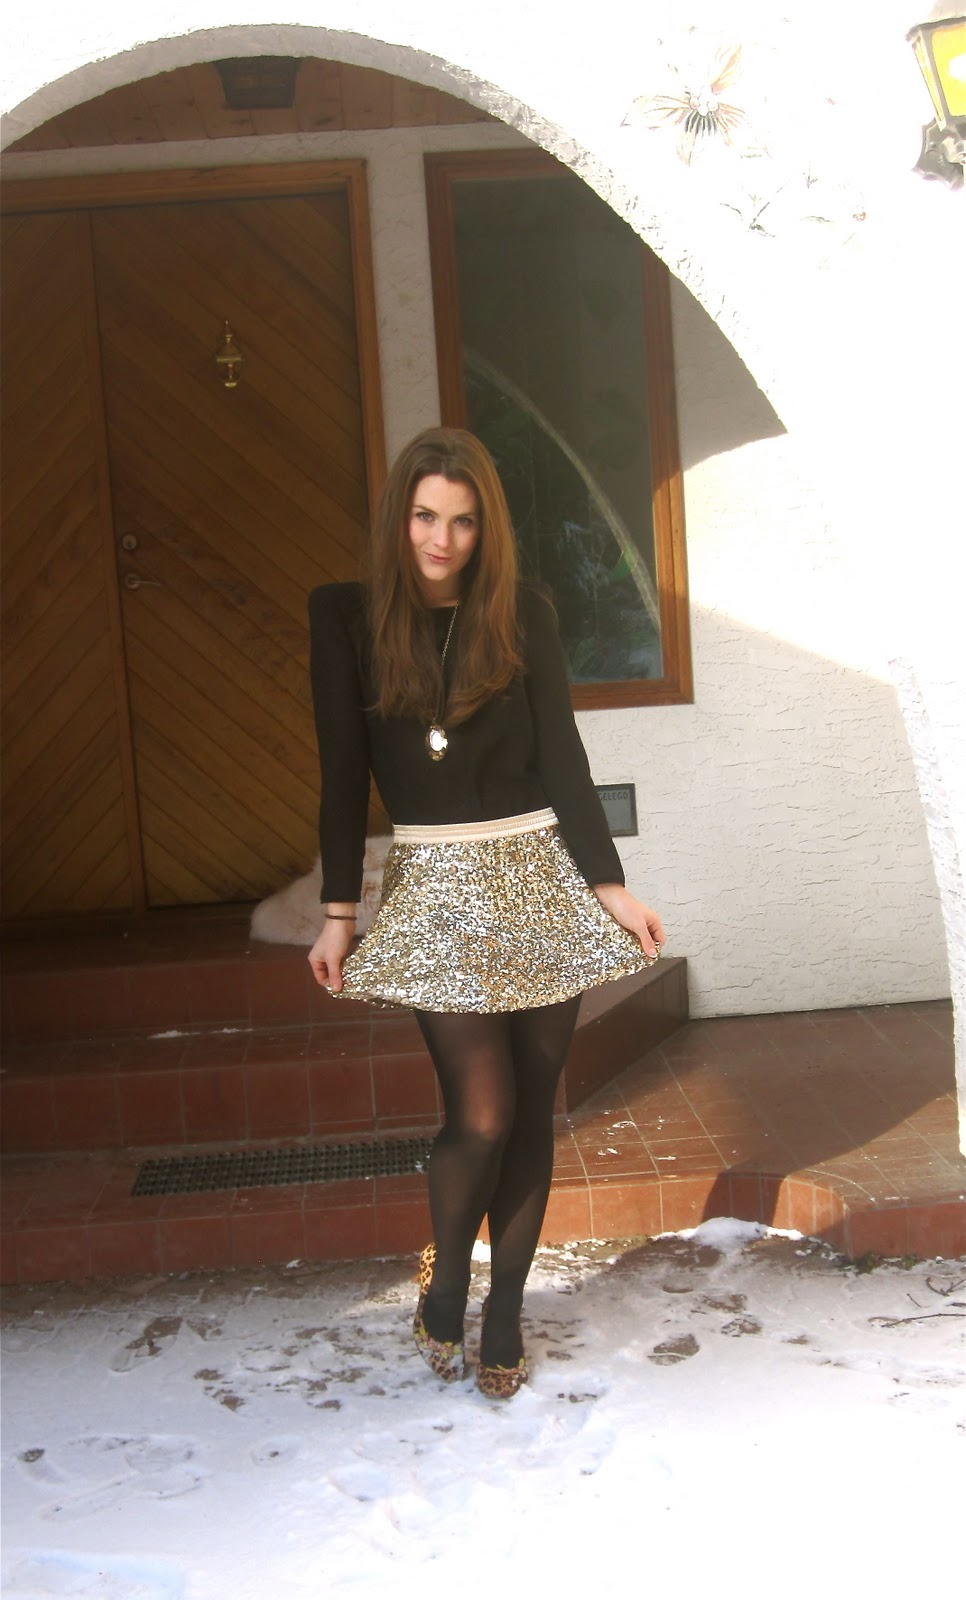 eb4aaadd59b5c Shoulder pad silk blouse  Zara